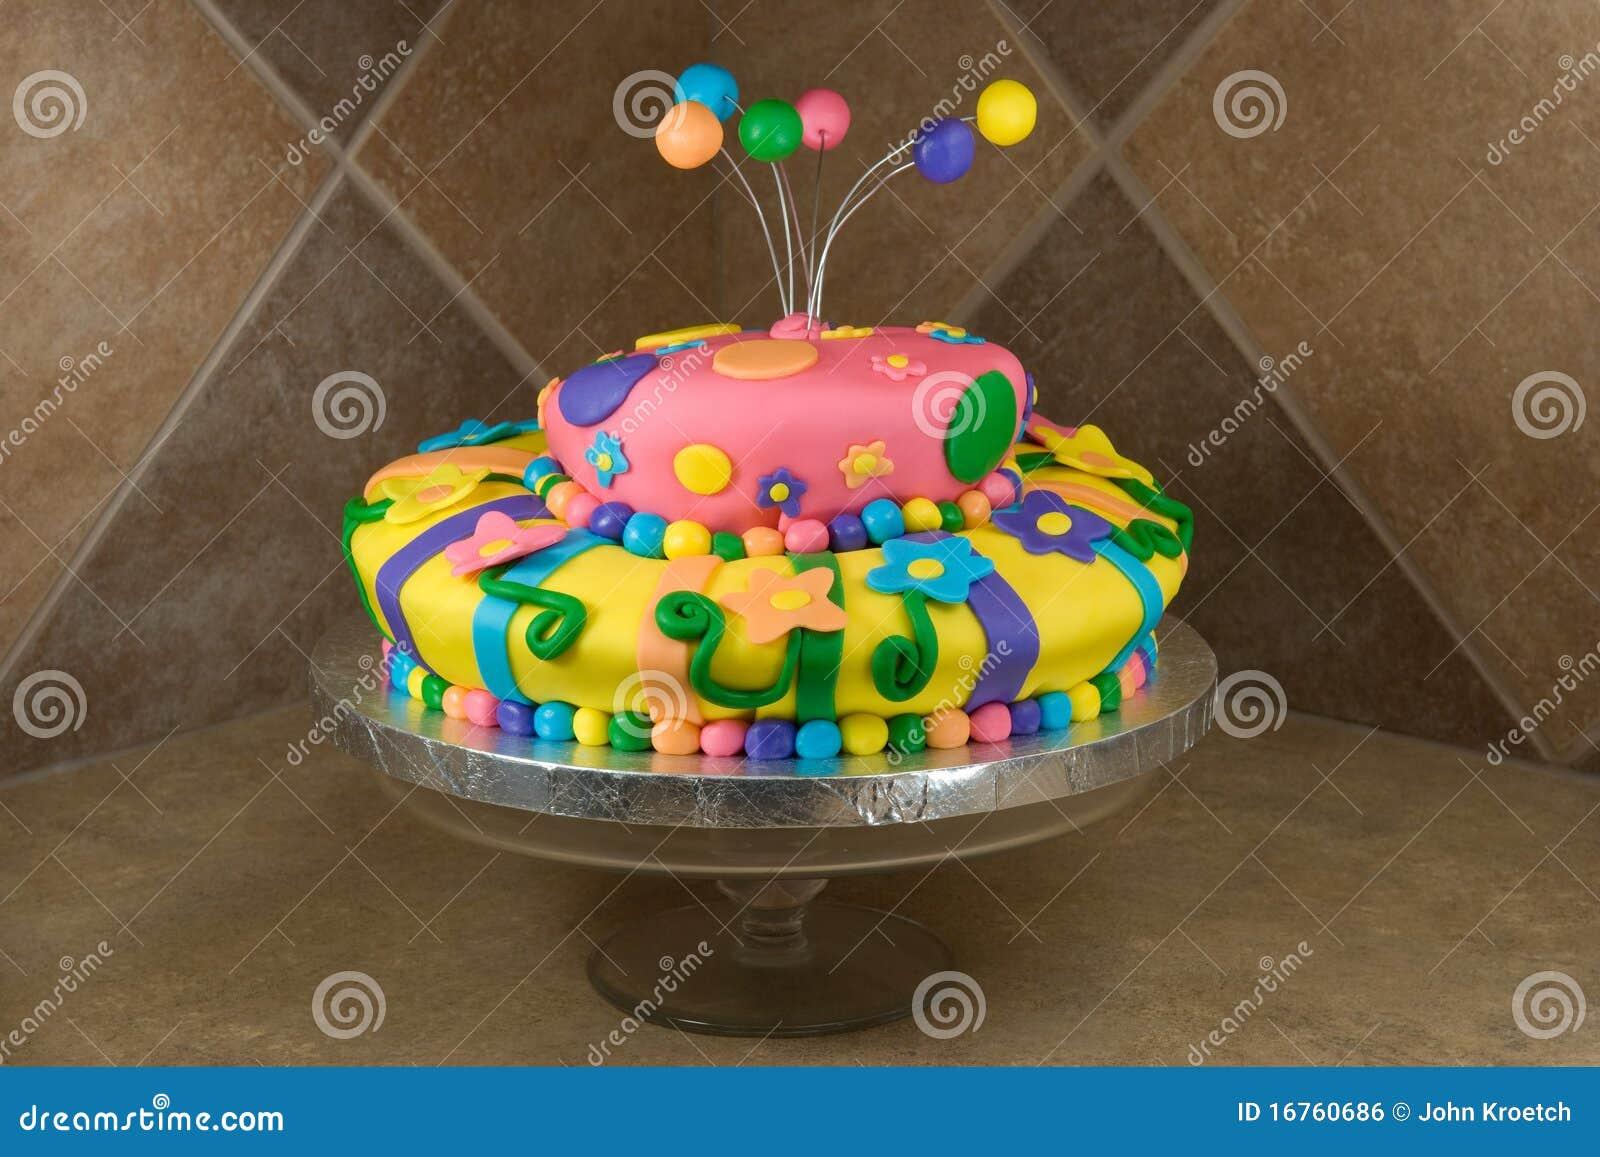 Decorated Birthday Cakes Fancy Decorated Birthday Cake Royalty Free Stock Photo Image